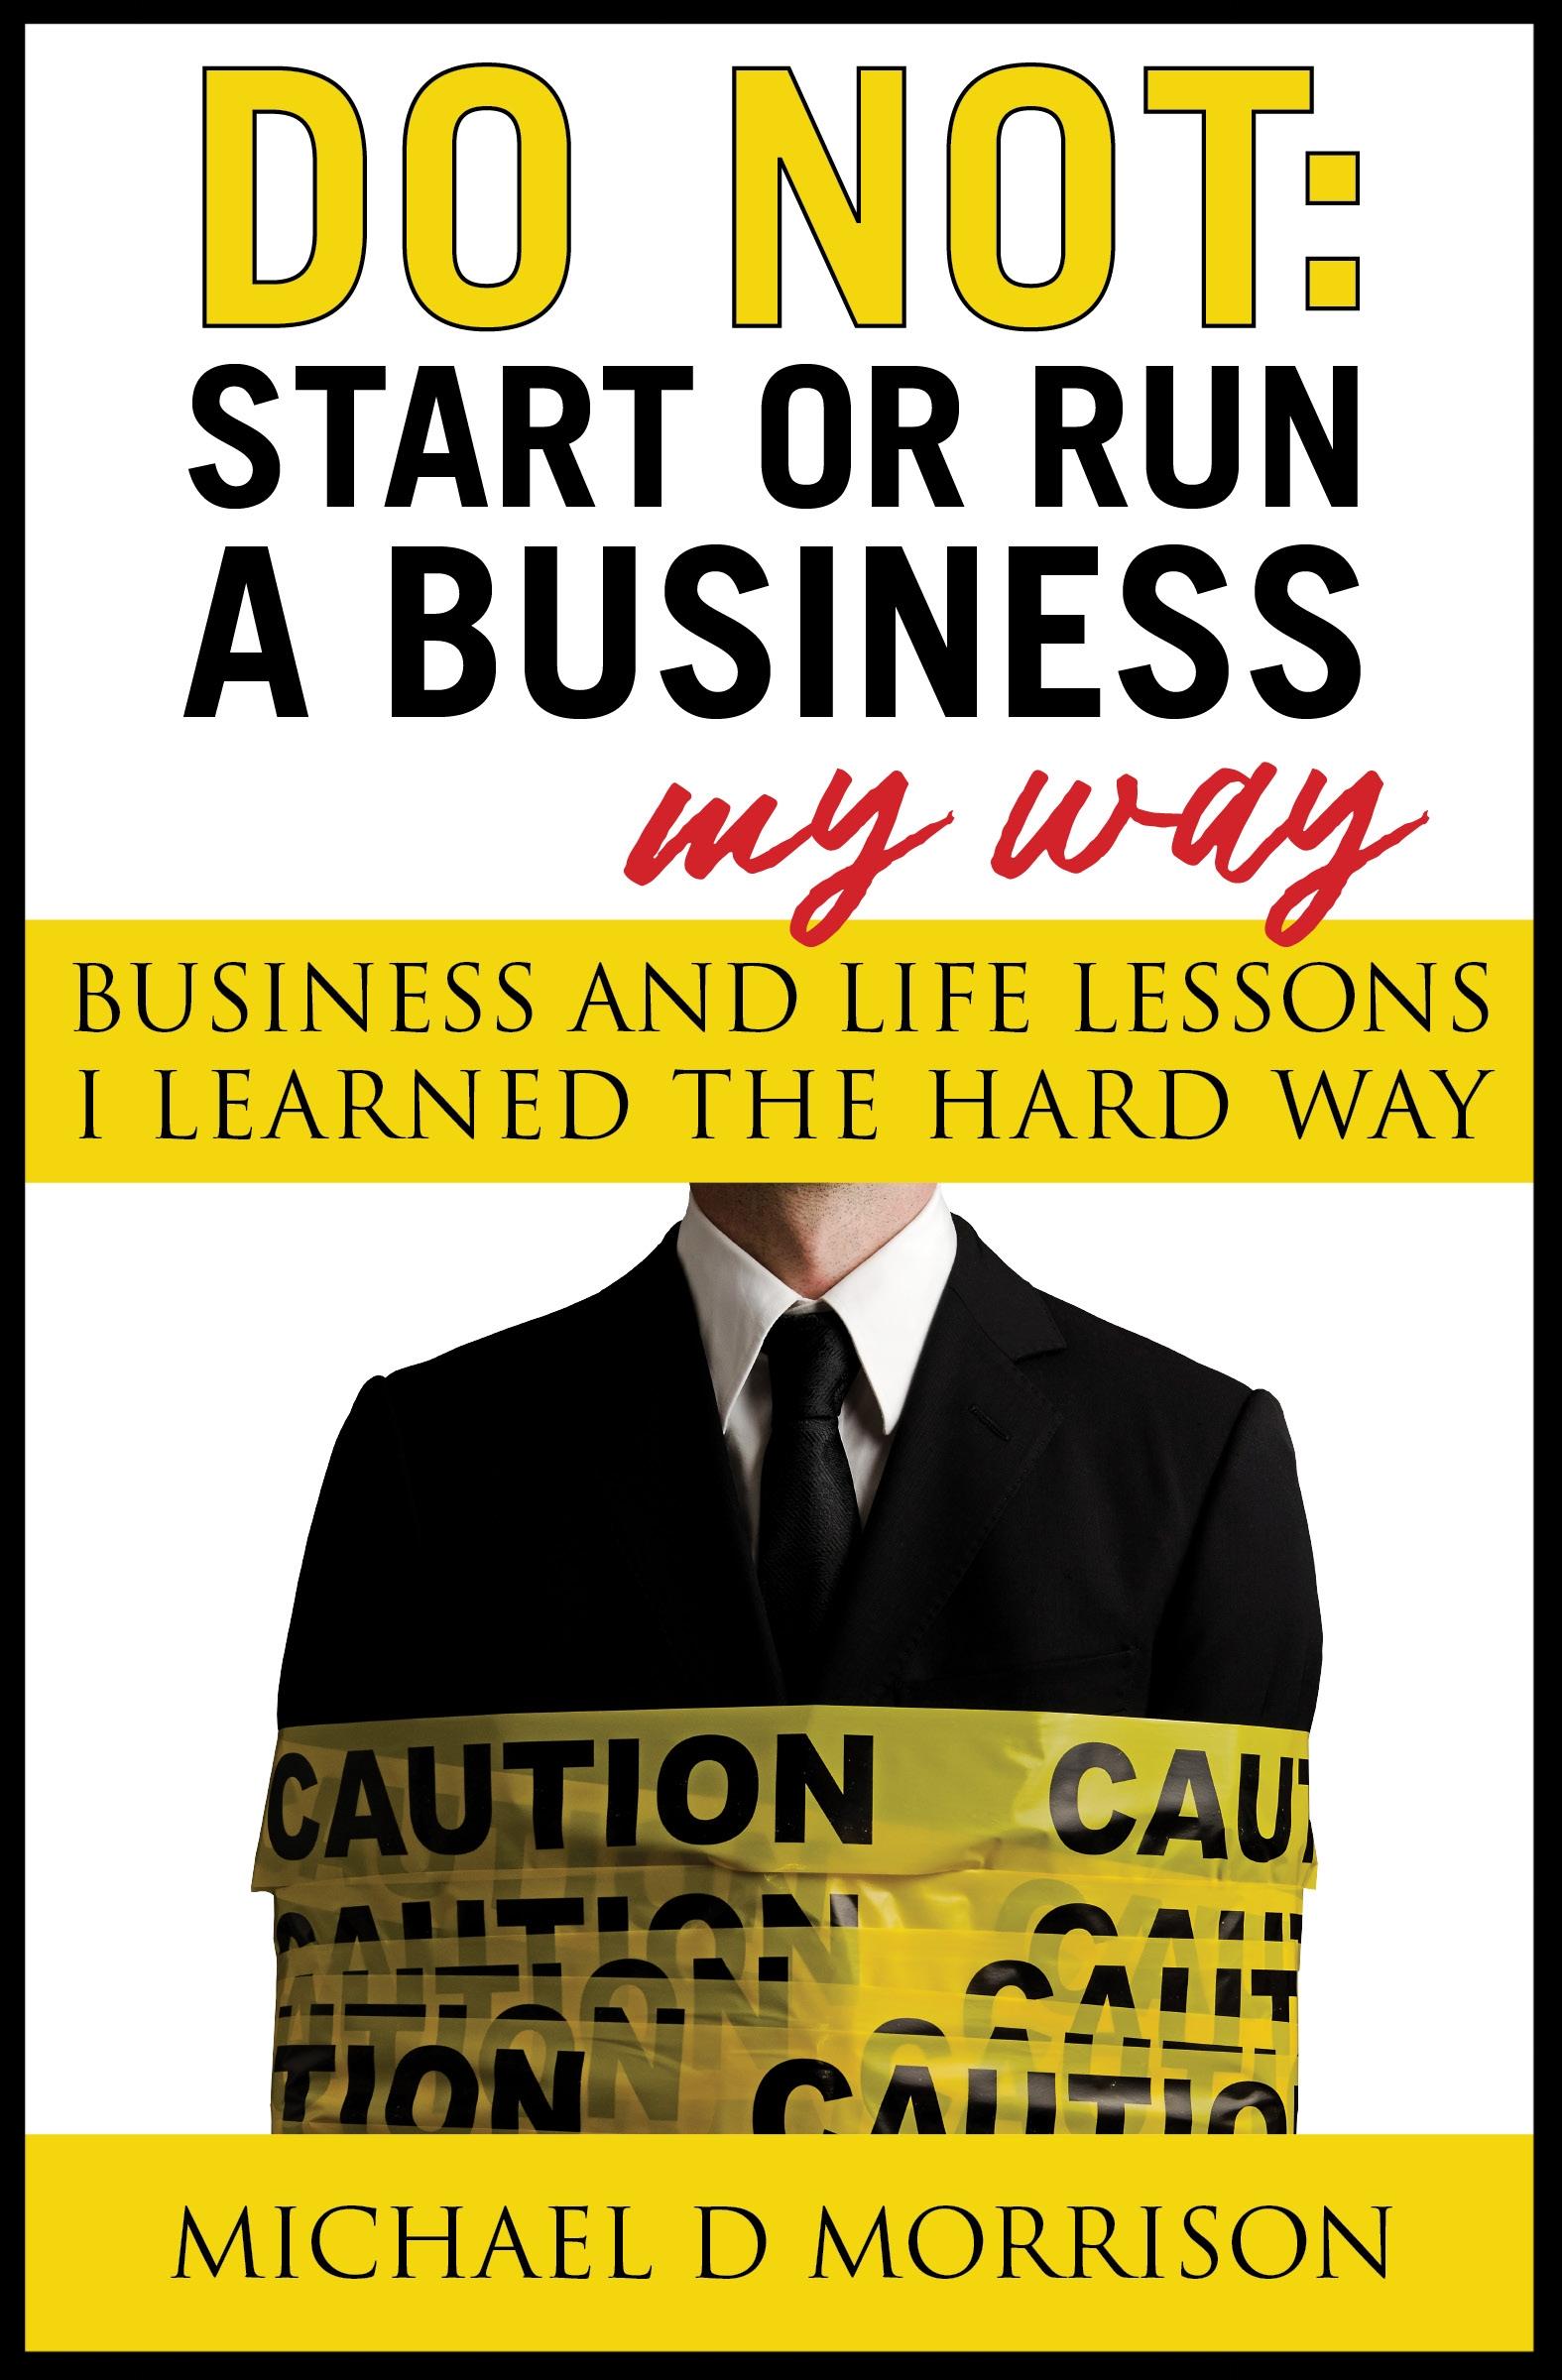 Book Cover - Michael D Morrison Enterprises.jpg